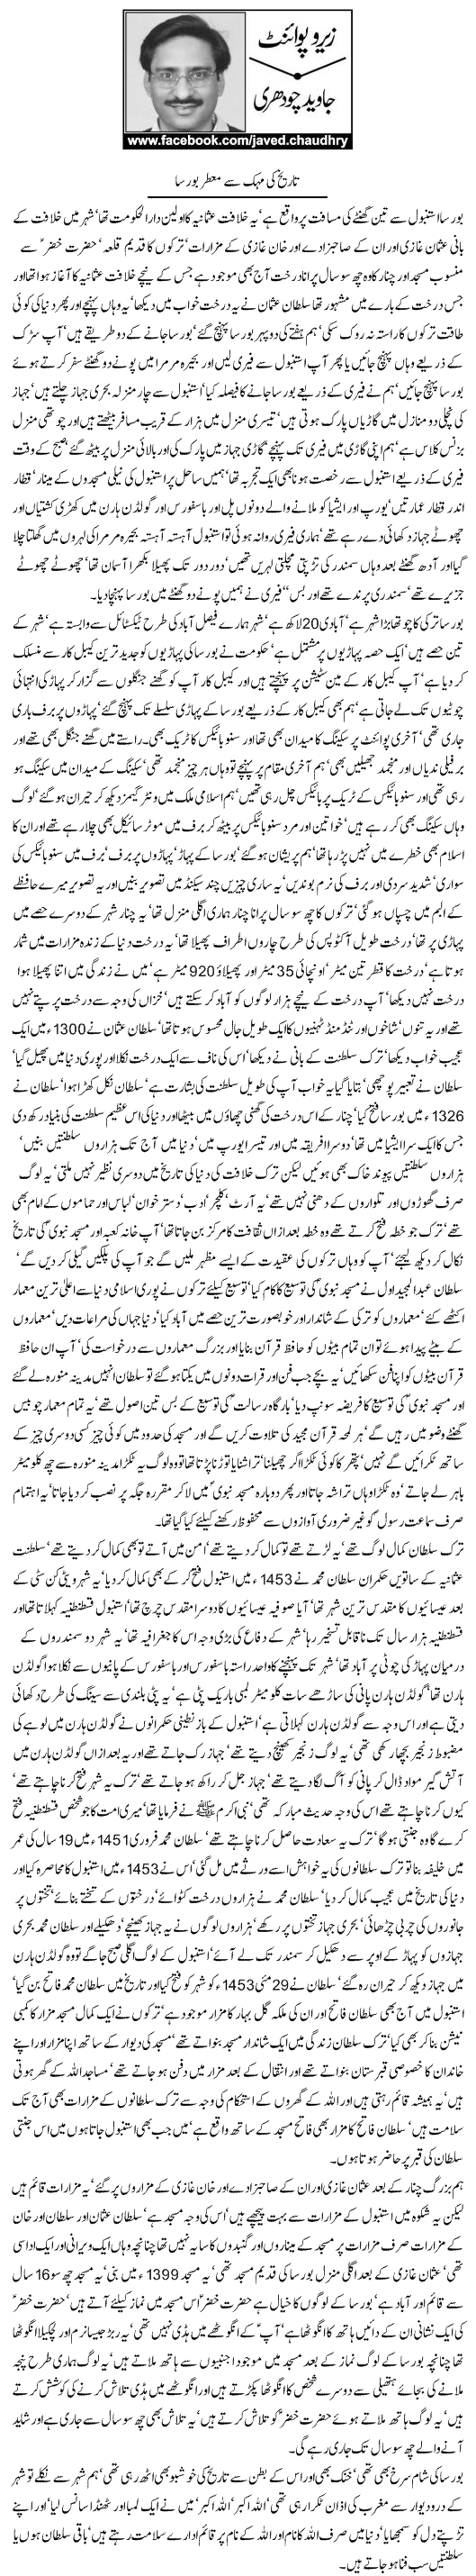 Tareekh Ki Mehk Se Muater Bursa By Javed Chaudhry - Pakfunny